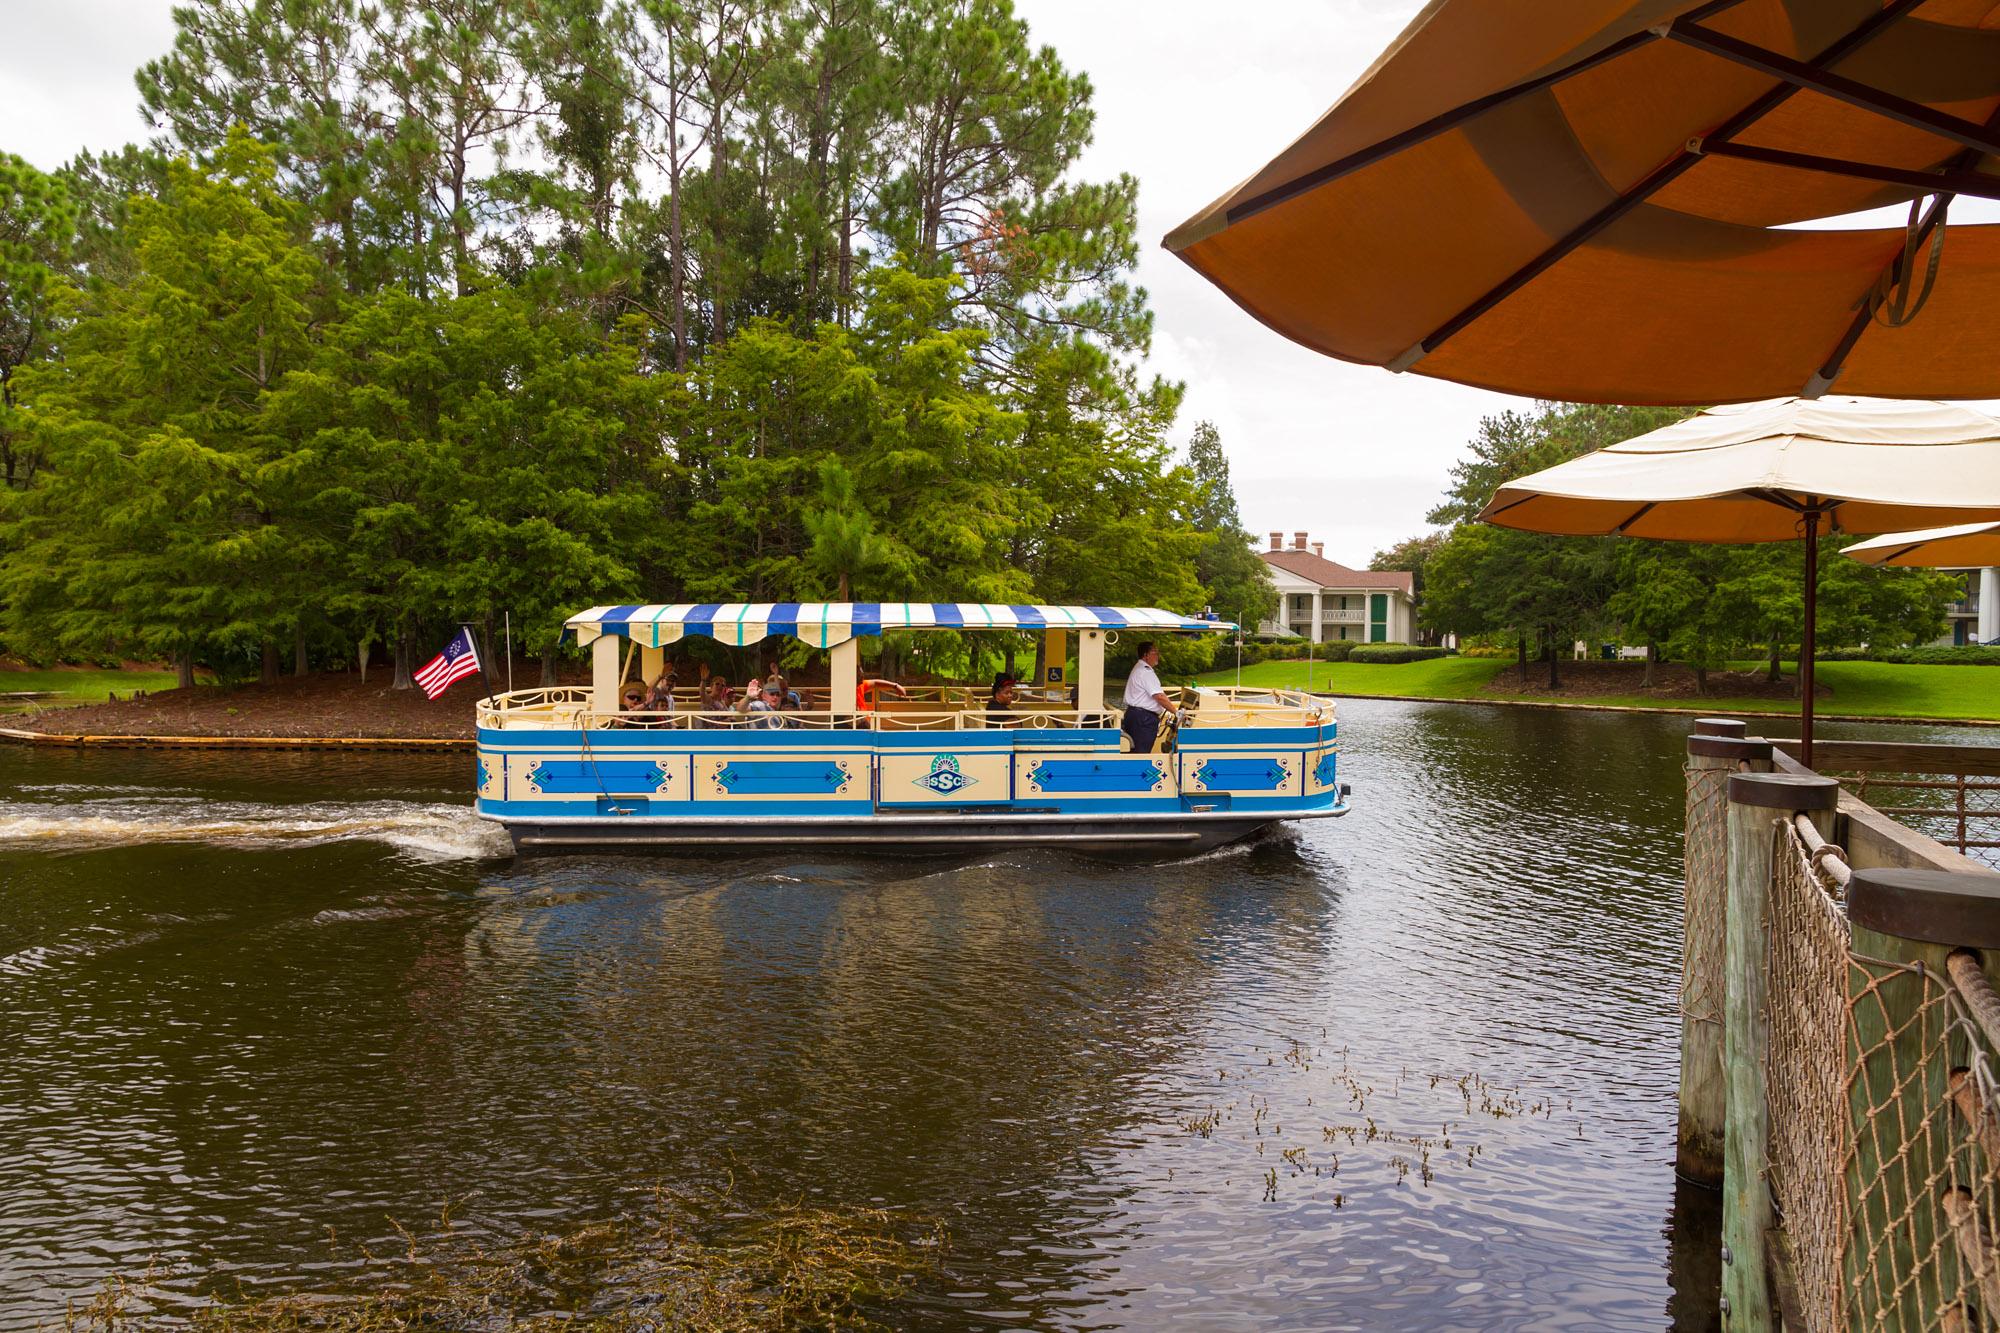 Sassagoula River Cruise Photo Gallery